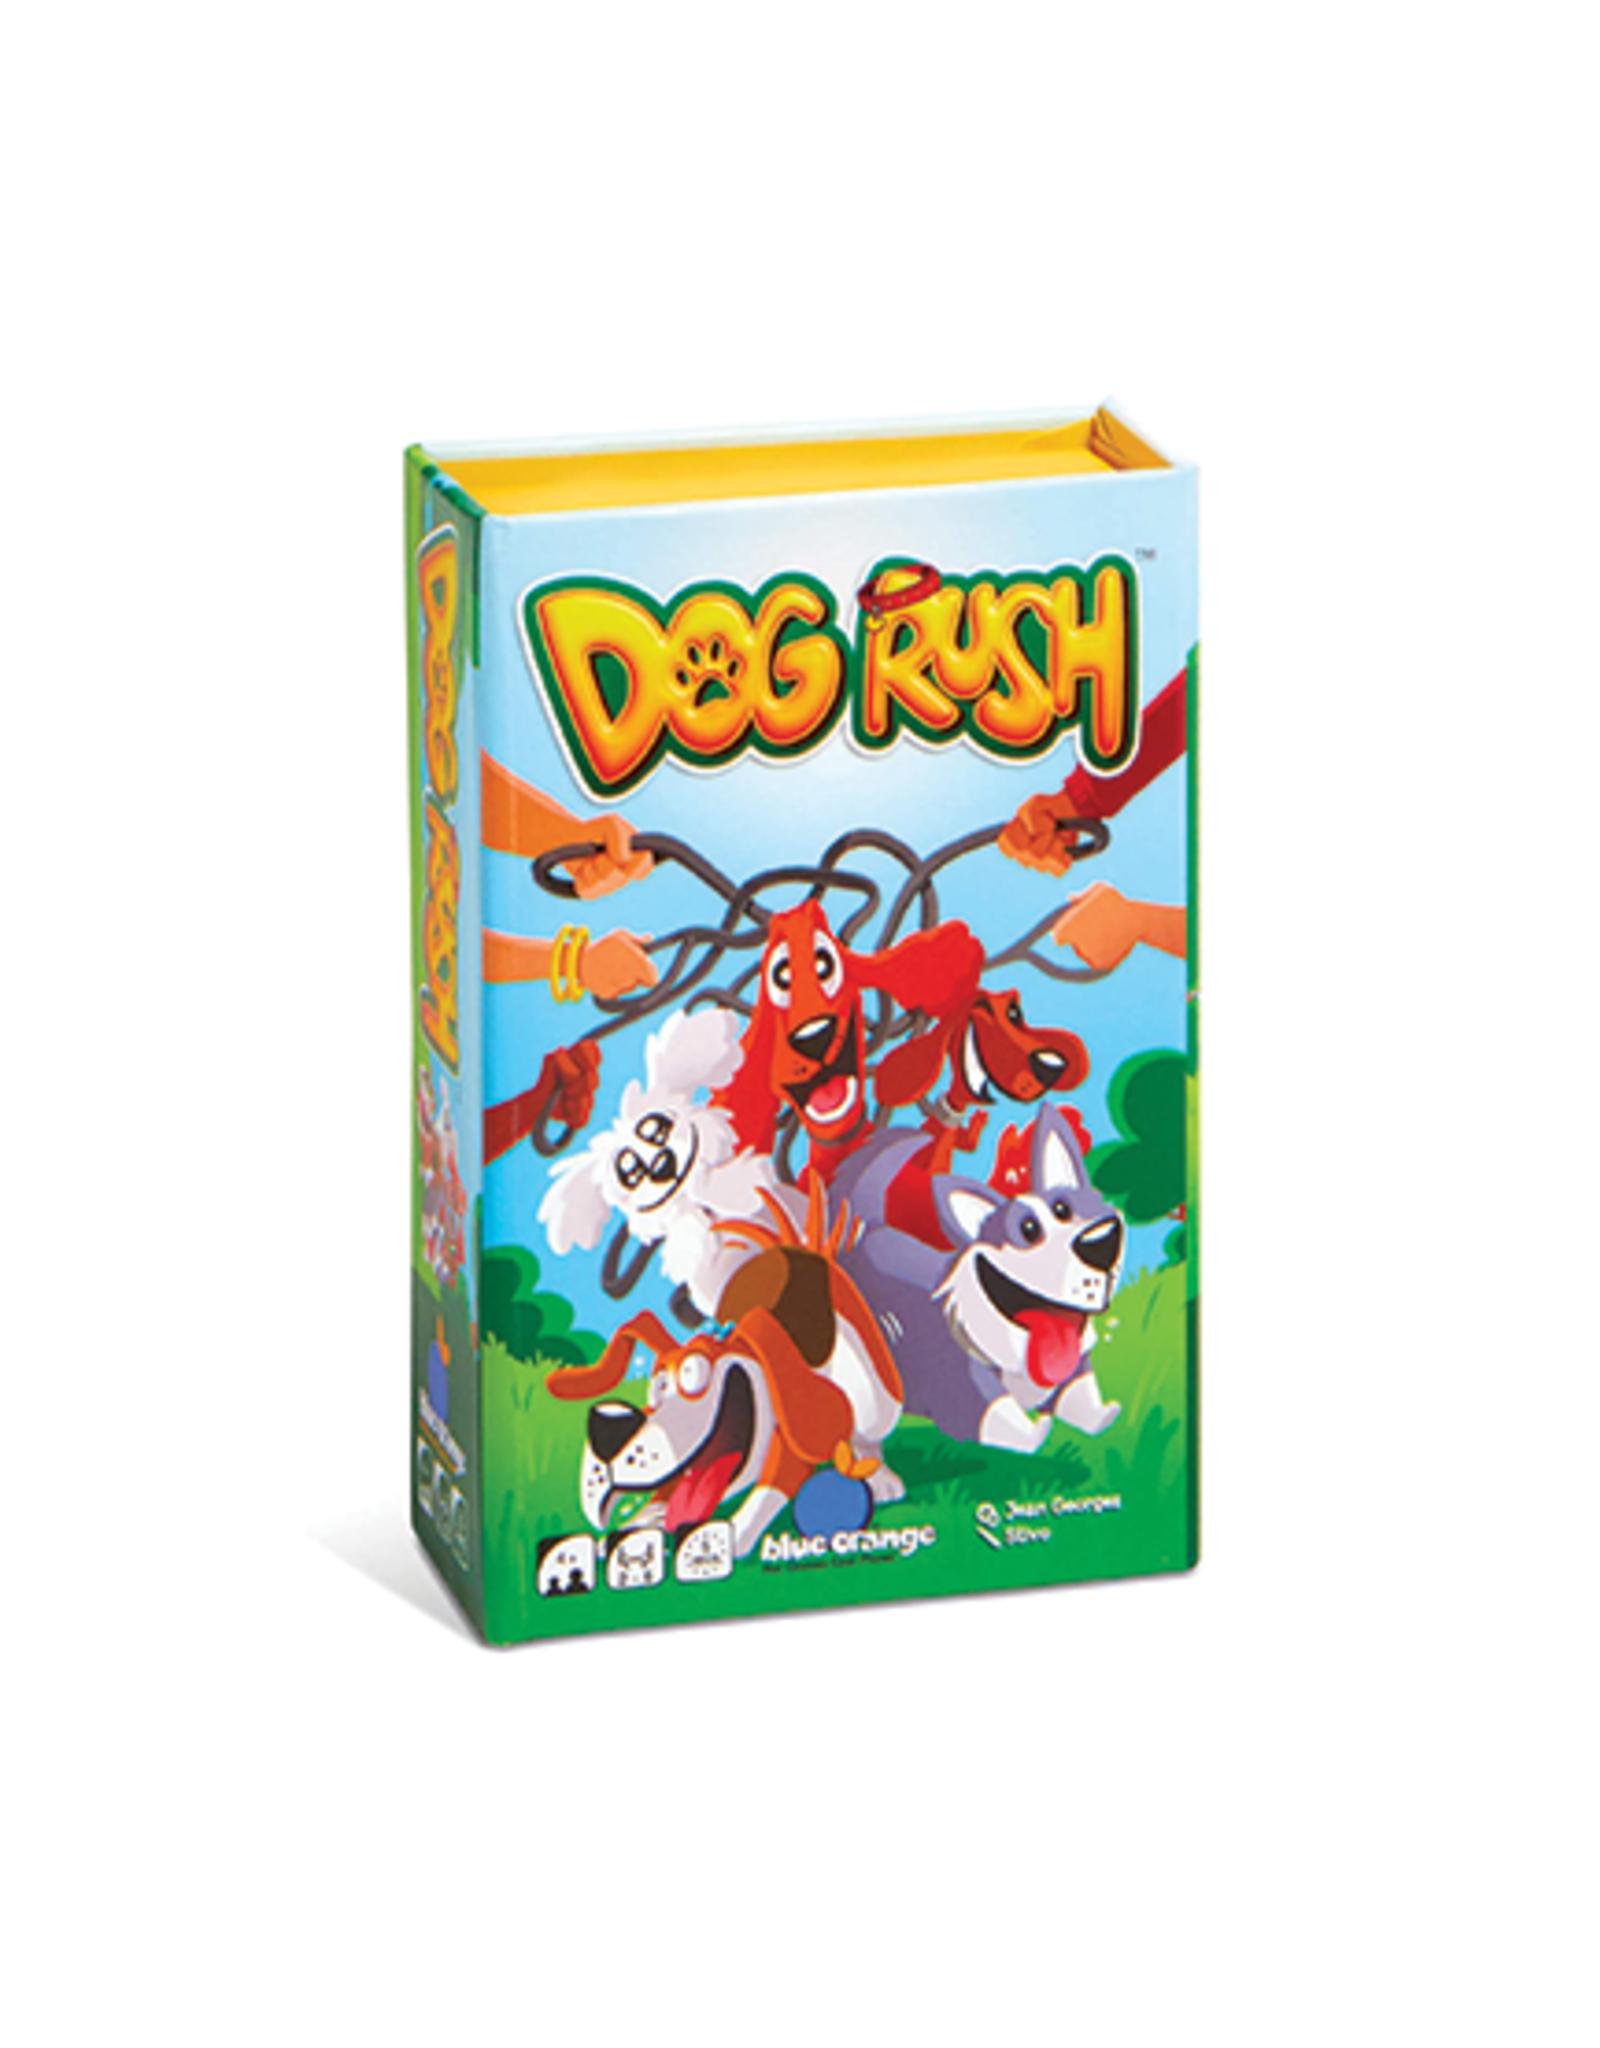 Blue Orange Dog Rush Mini Game